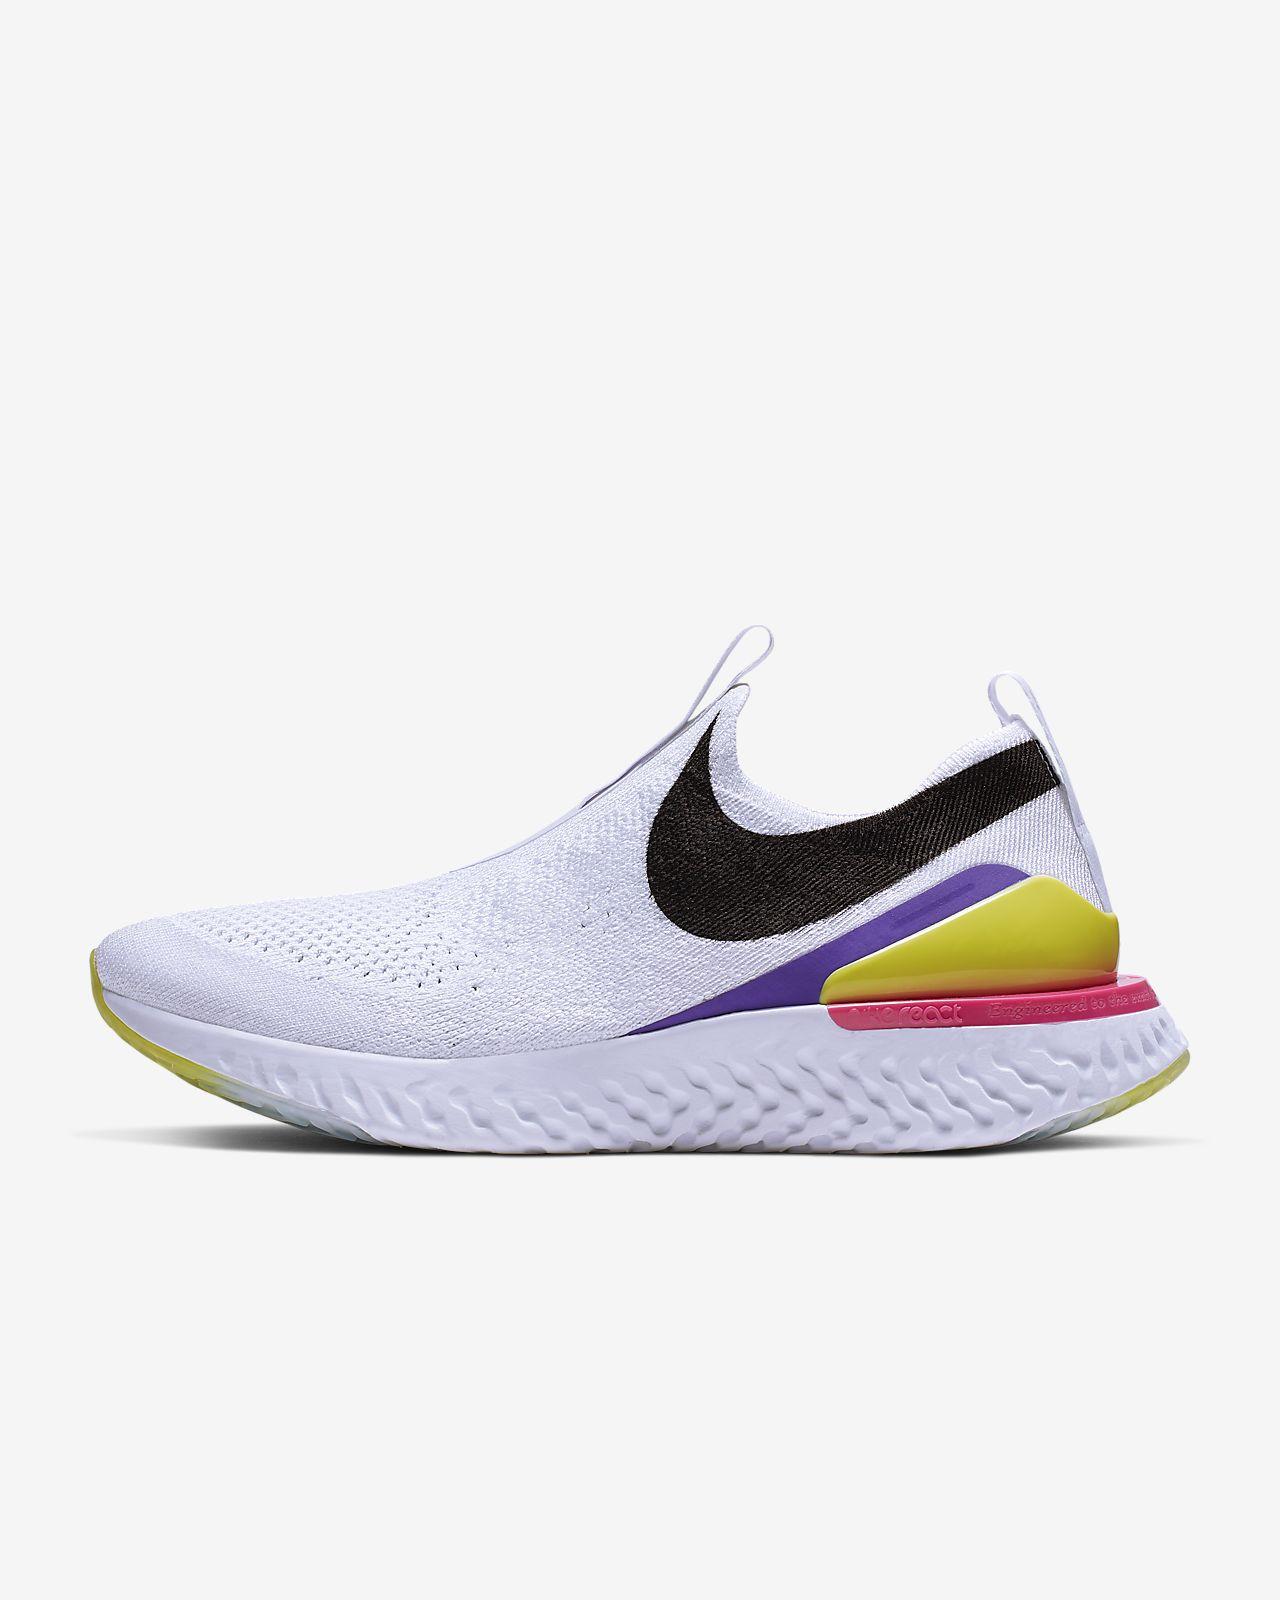 bonito Nike Free RN 5.0 Women's Running Shoe para barato